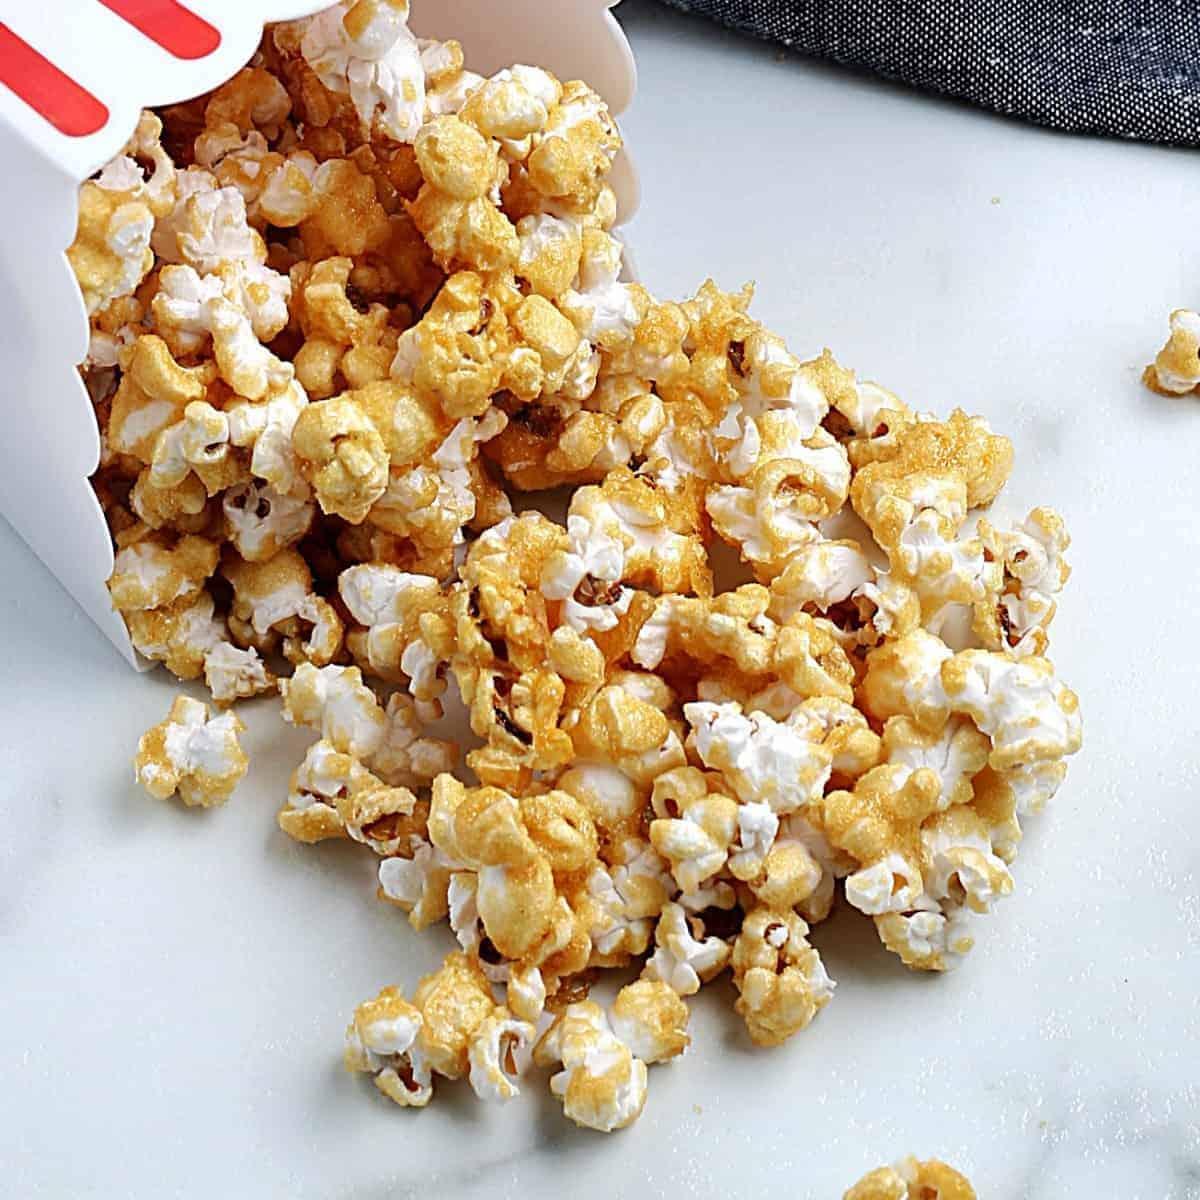 Vegan Popcorn With Caramel Vegan In The Freezer